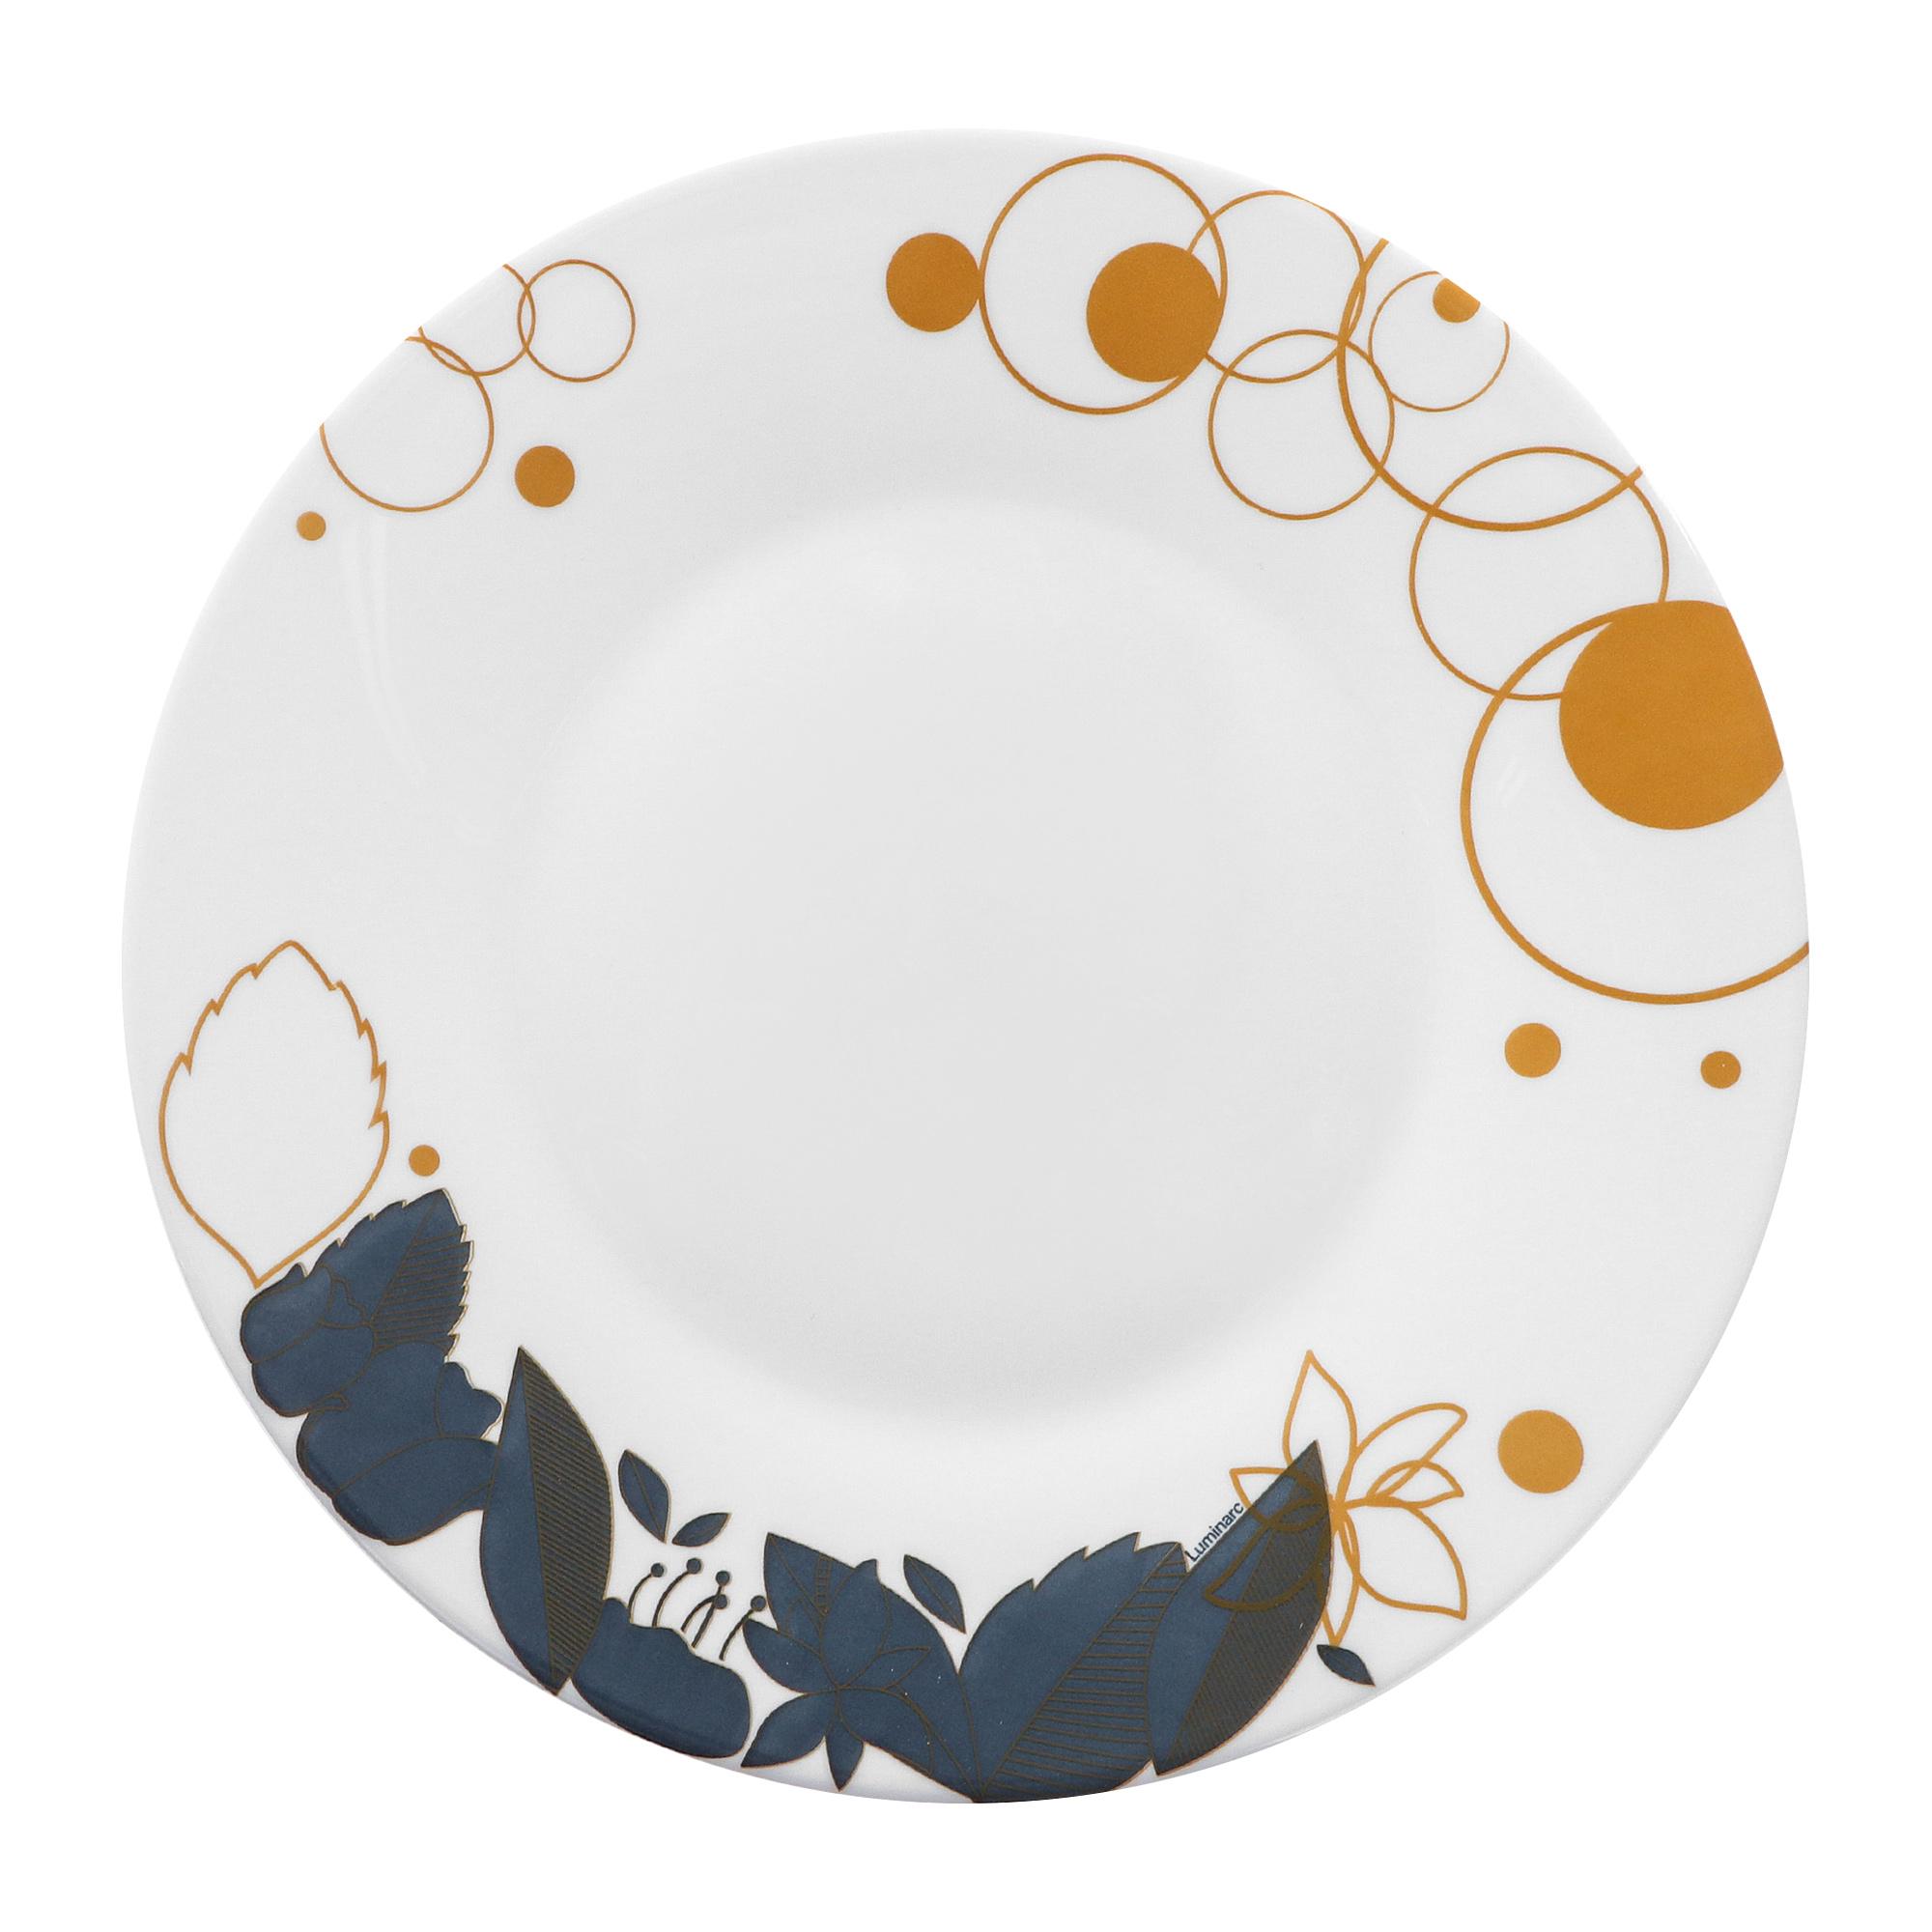 Тарелка десертная Luminarc Orme 22 см luminarc тарелка десертная latone 22 см белый